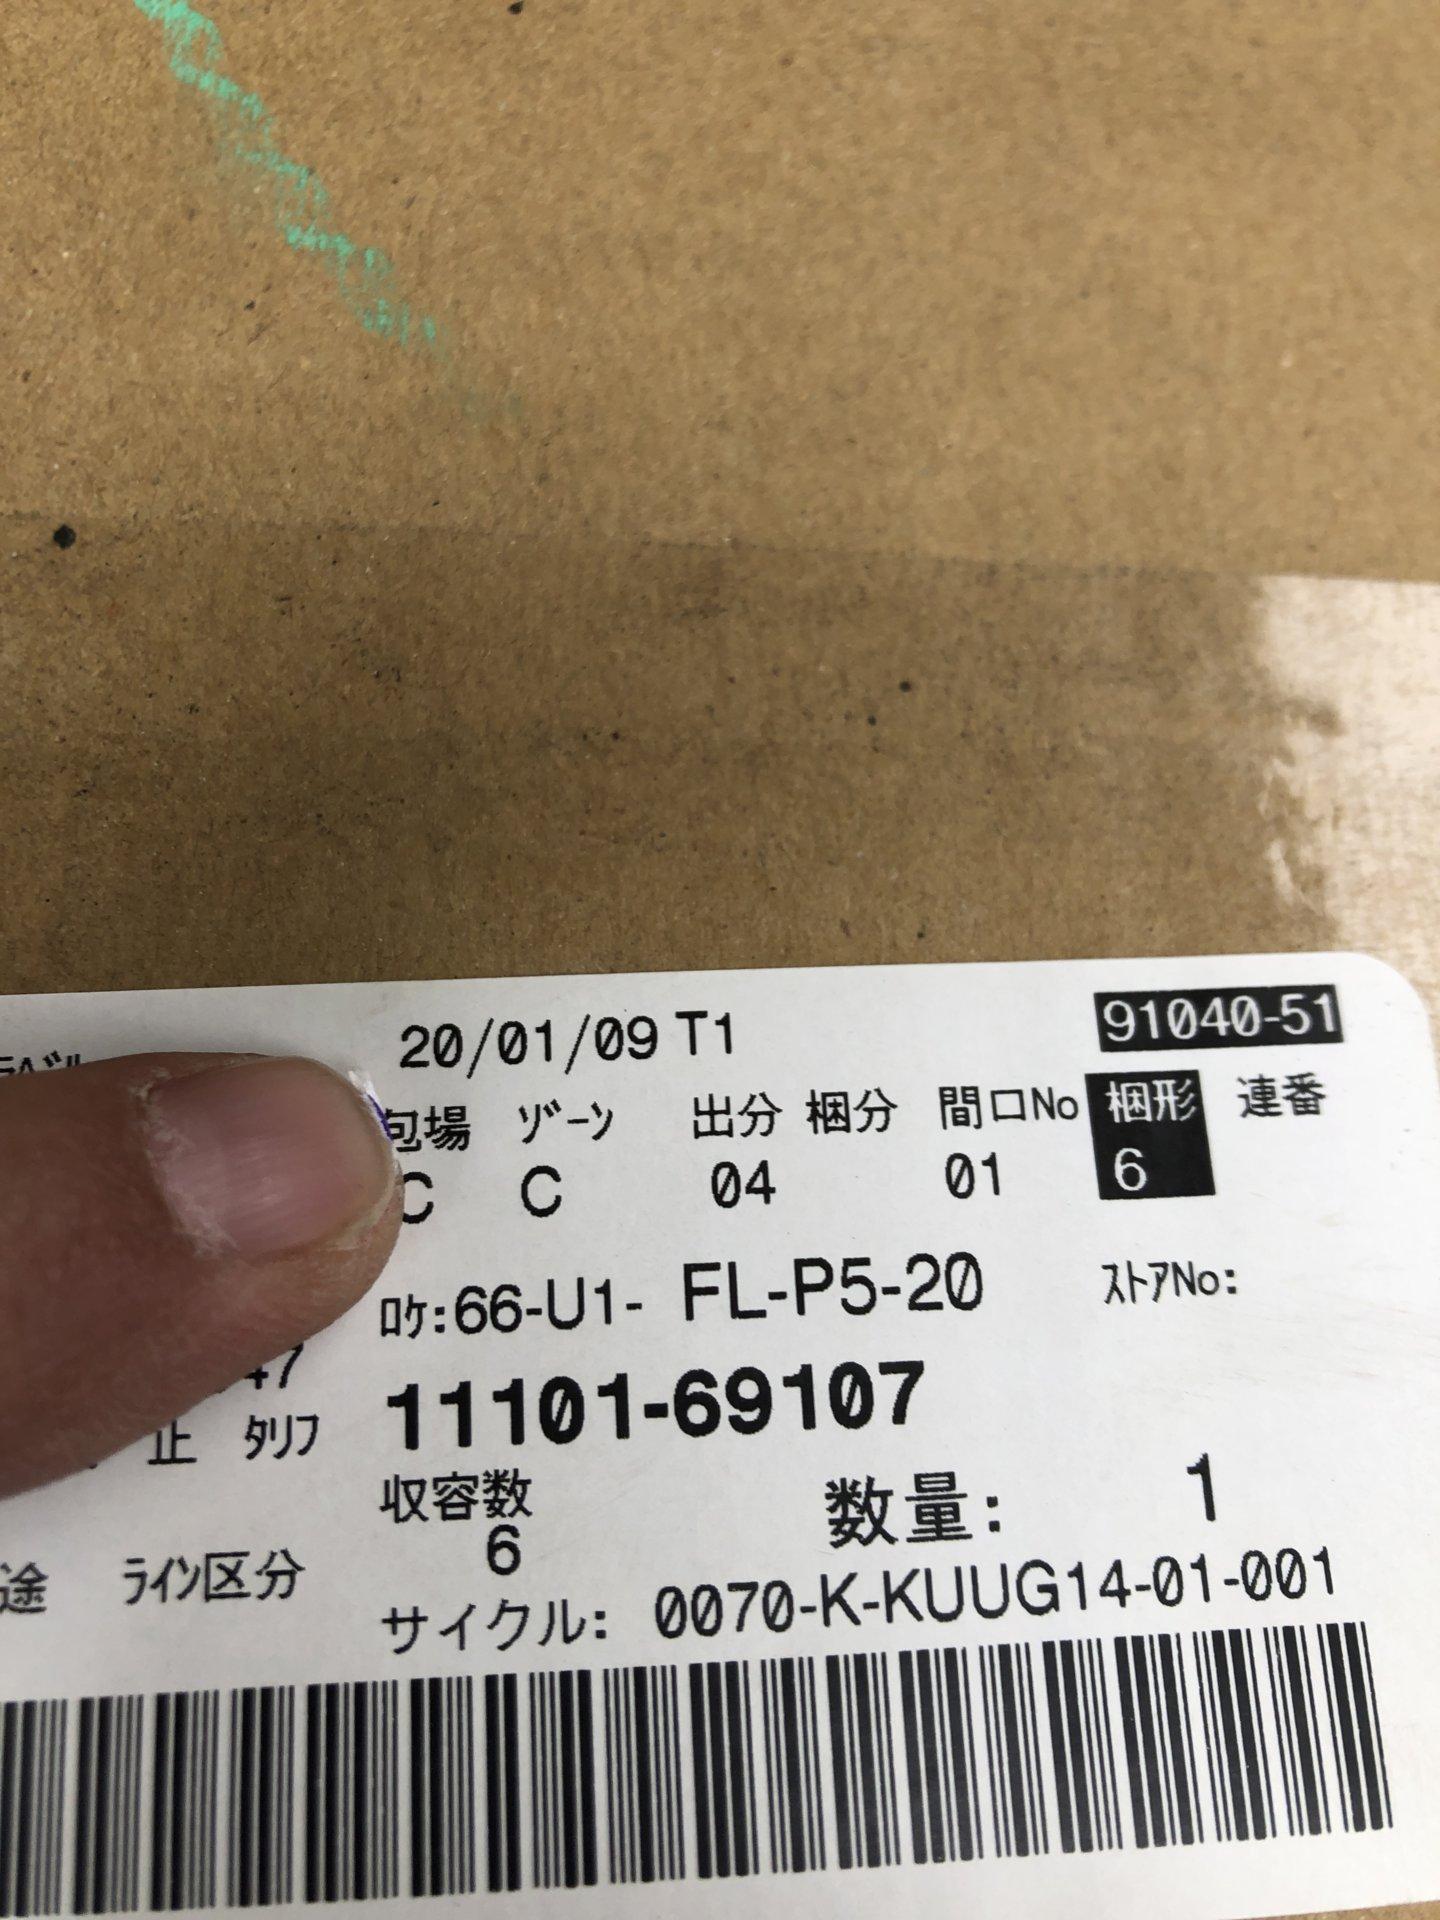 1EA388AF-BE72-466E-8049-7206C0ABDFDA.jpeg